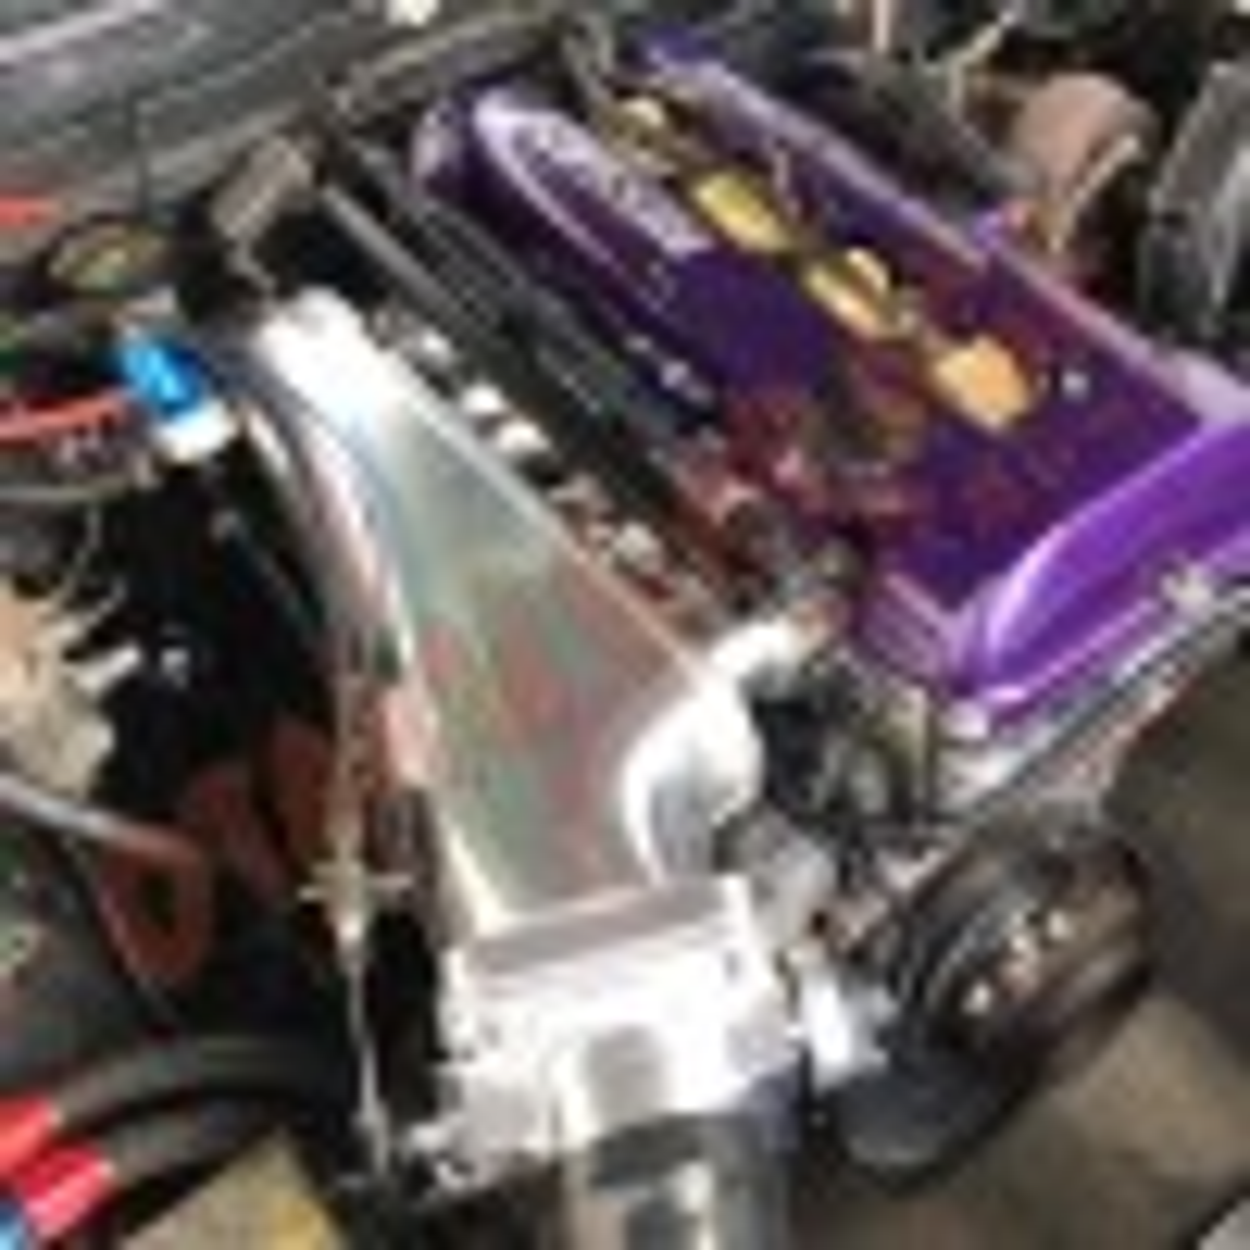 Otaku Garage Billet Intake Manifold/ Forward Facing Plenum SR20DET S13 180SX / S14 200SX / S15